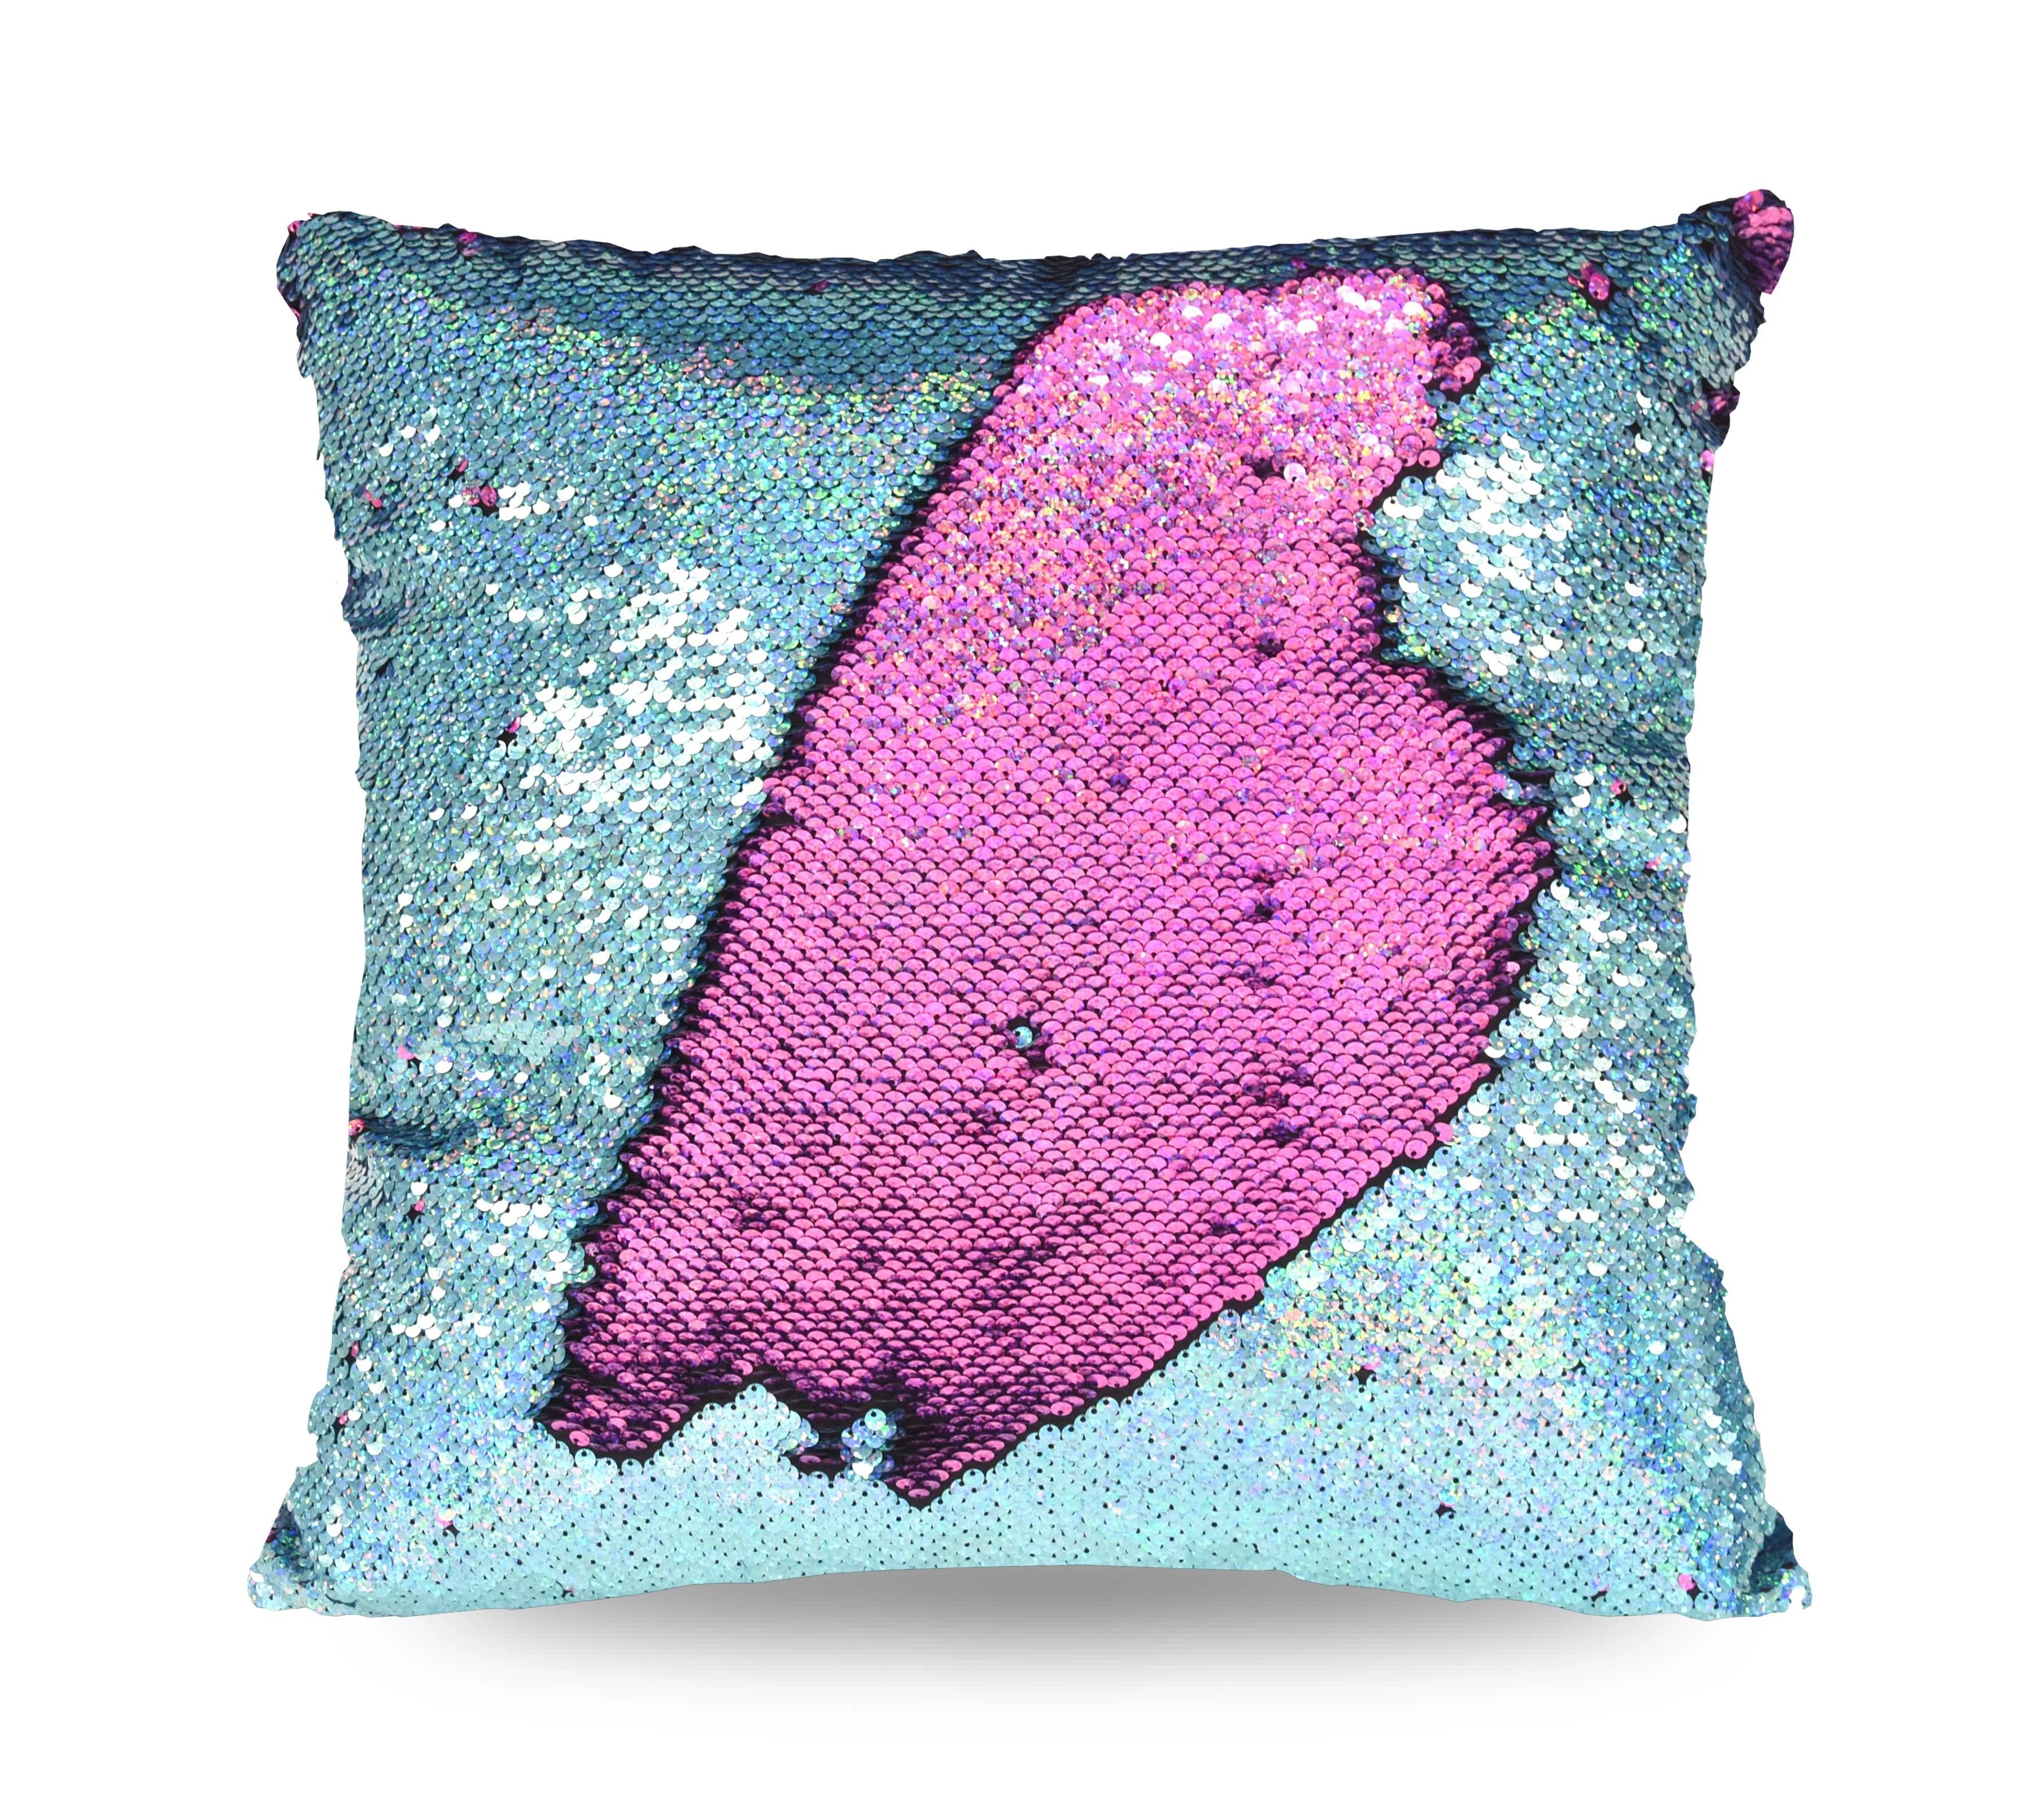 mainstays holographic reversible sequins sparkle pillow 17 x 17